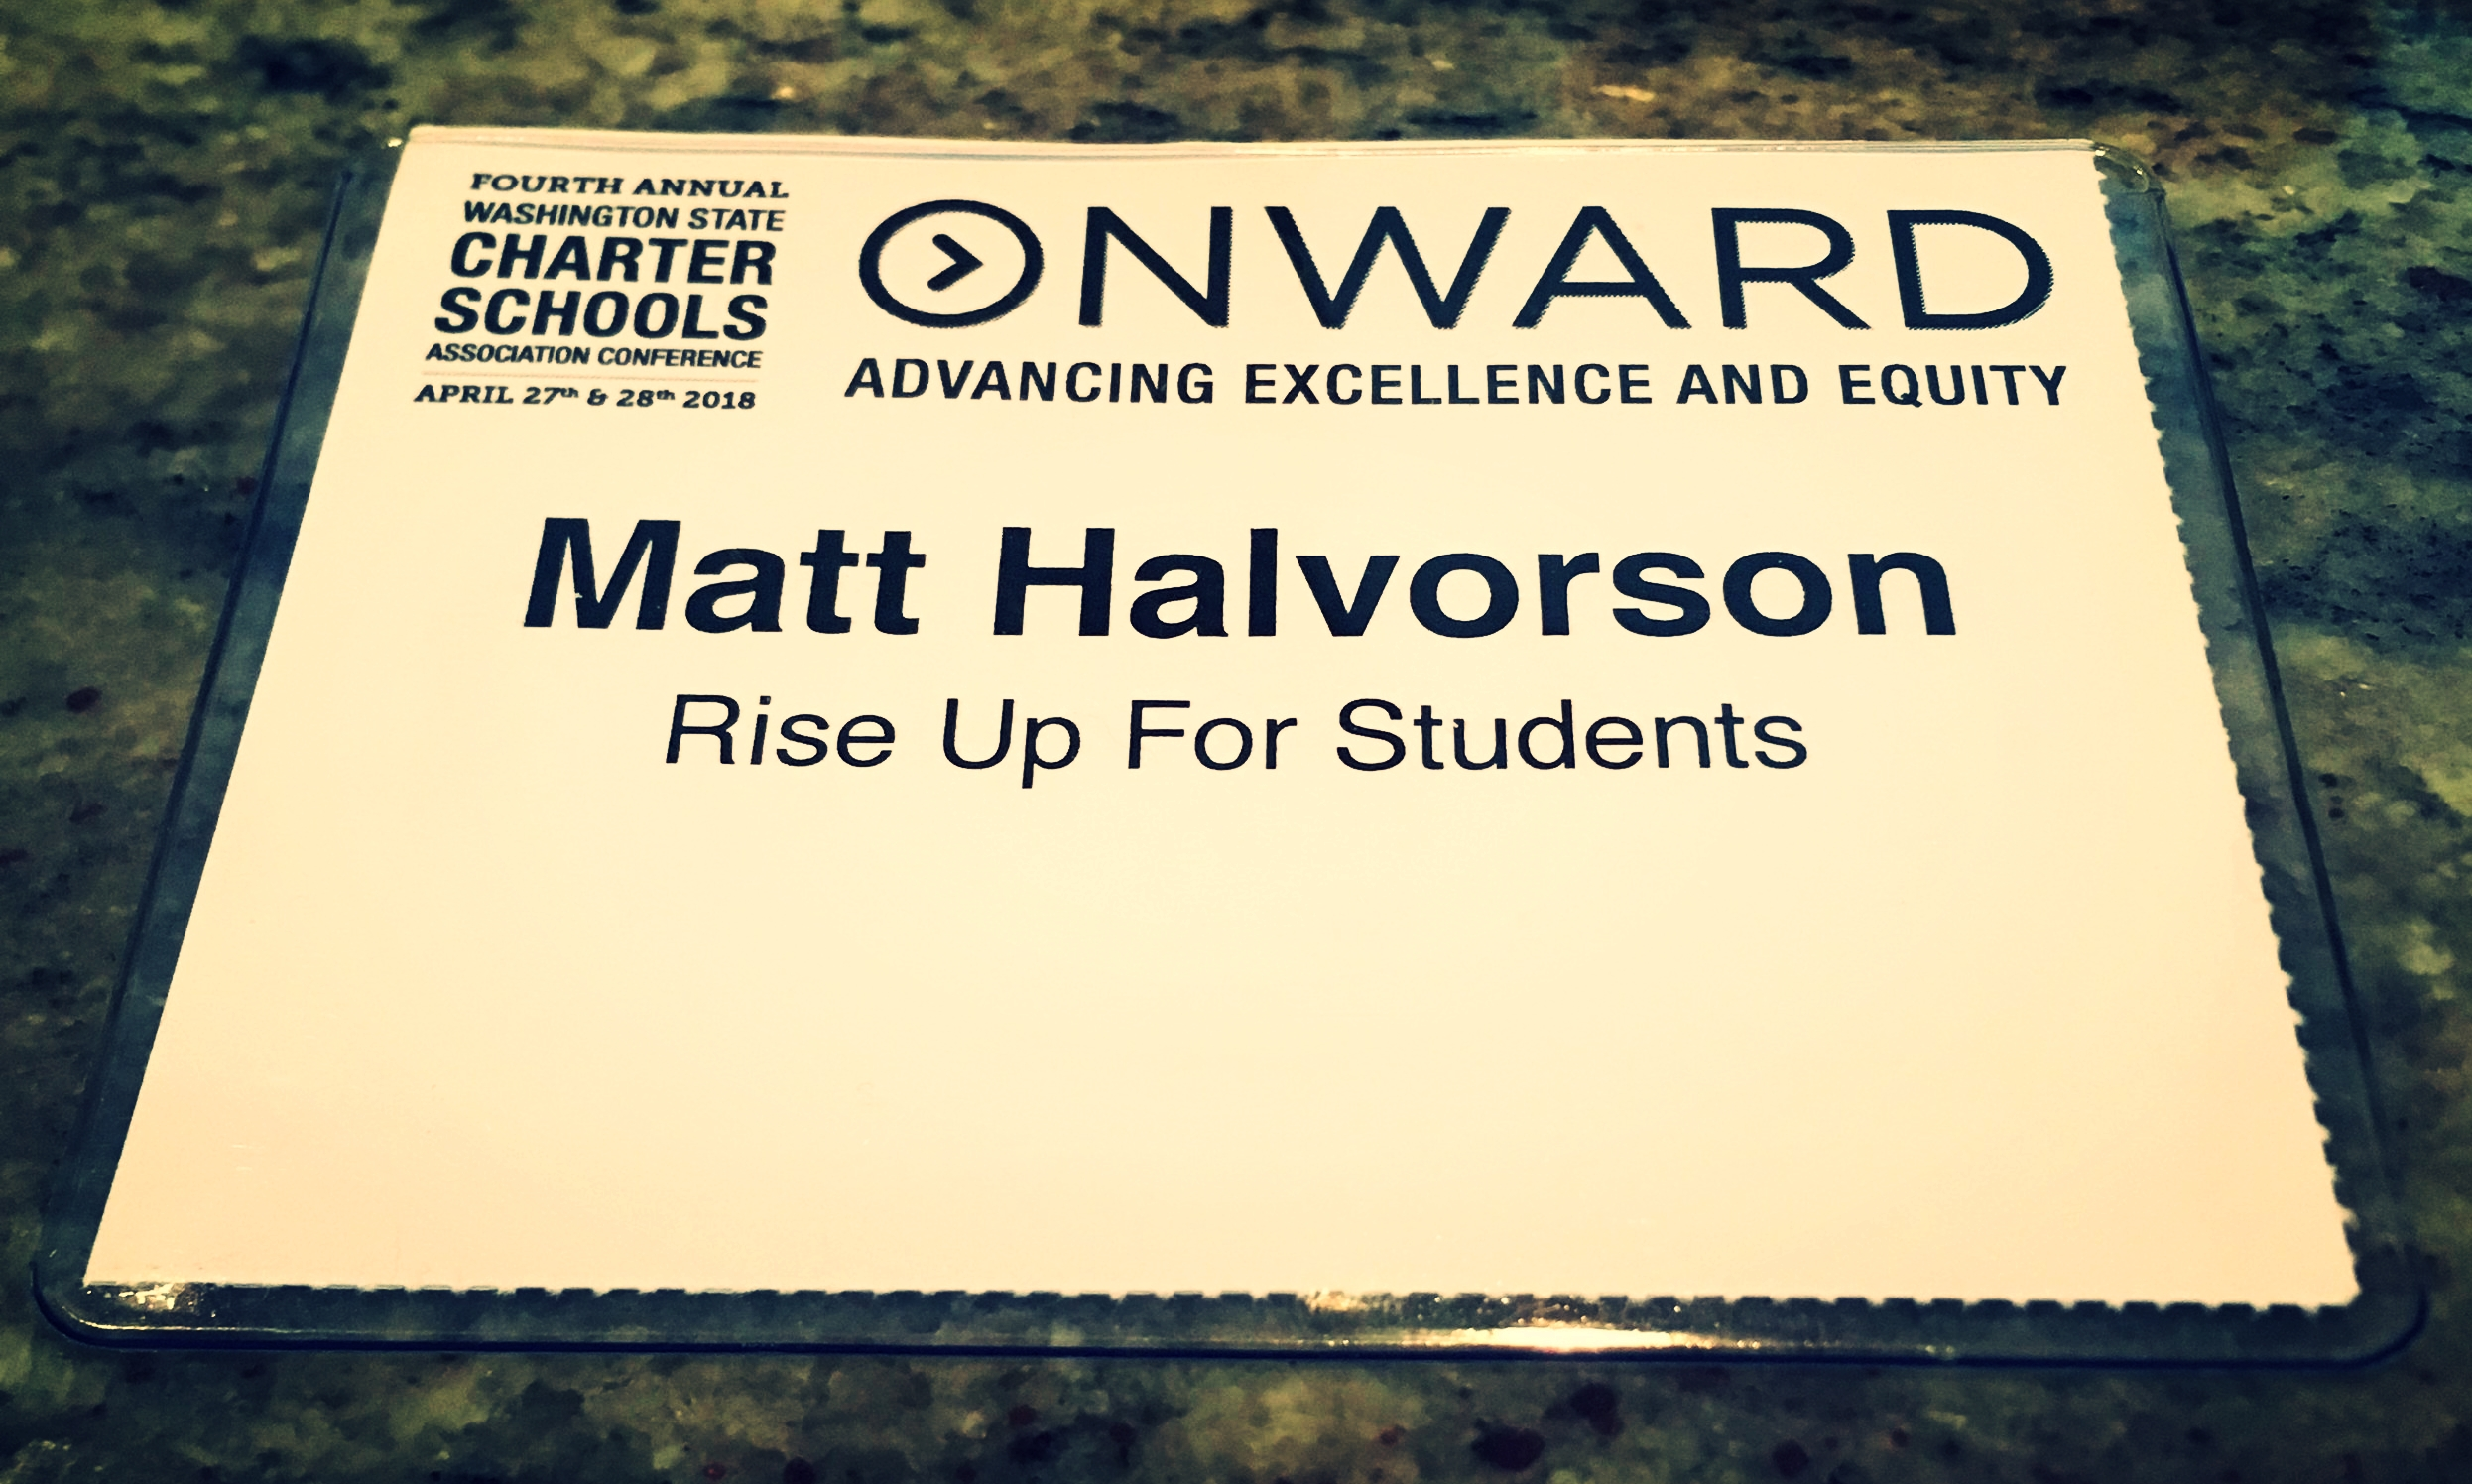 Matt Halvorson Name Badge - Rise Up For Students